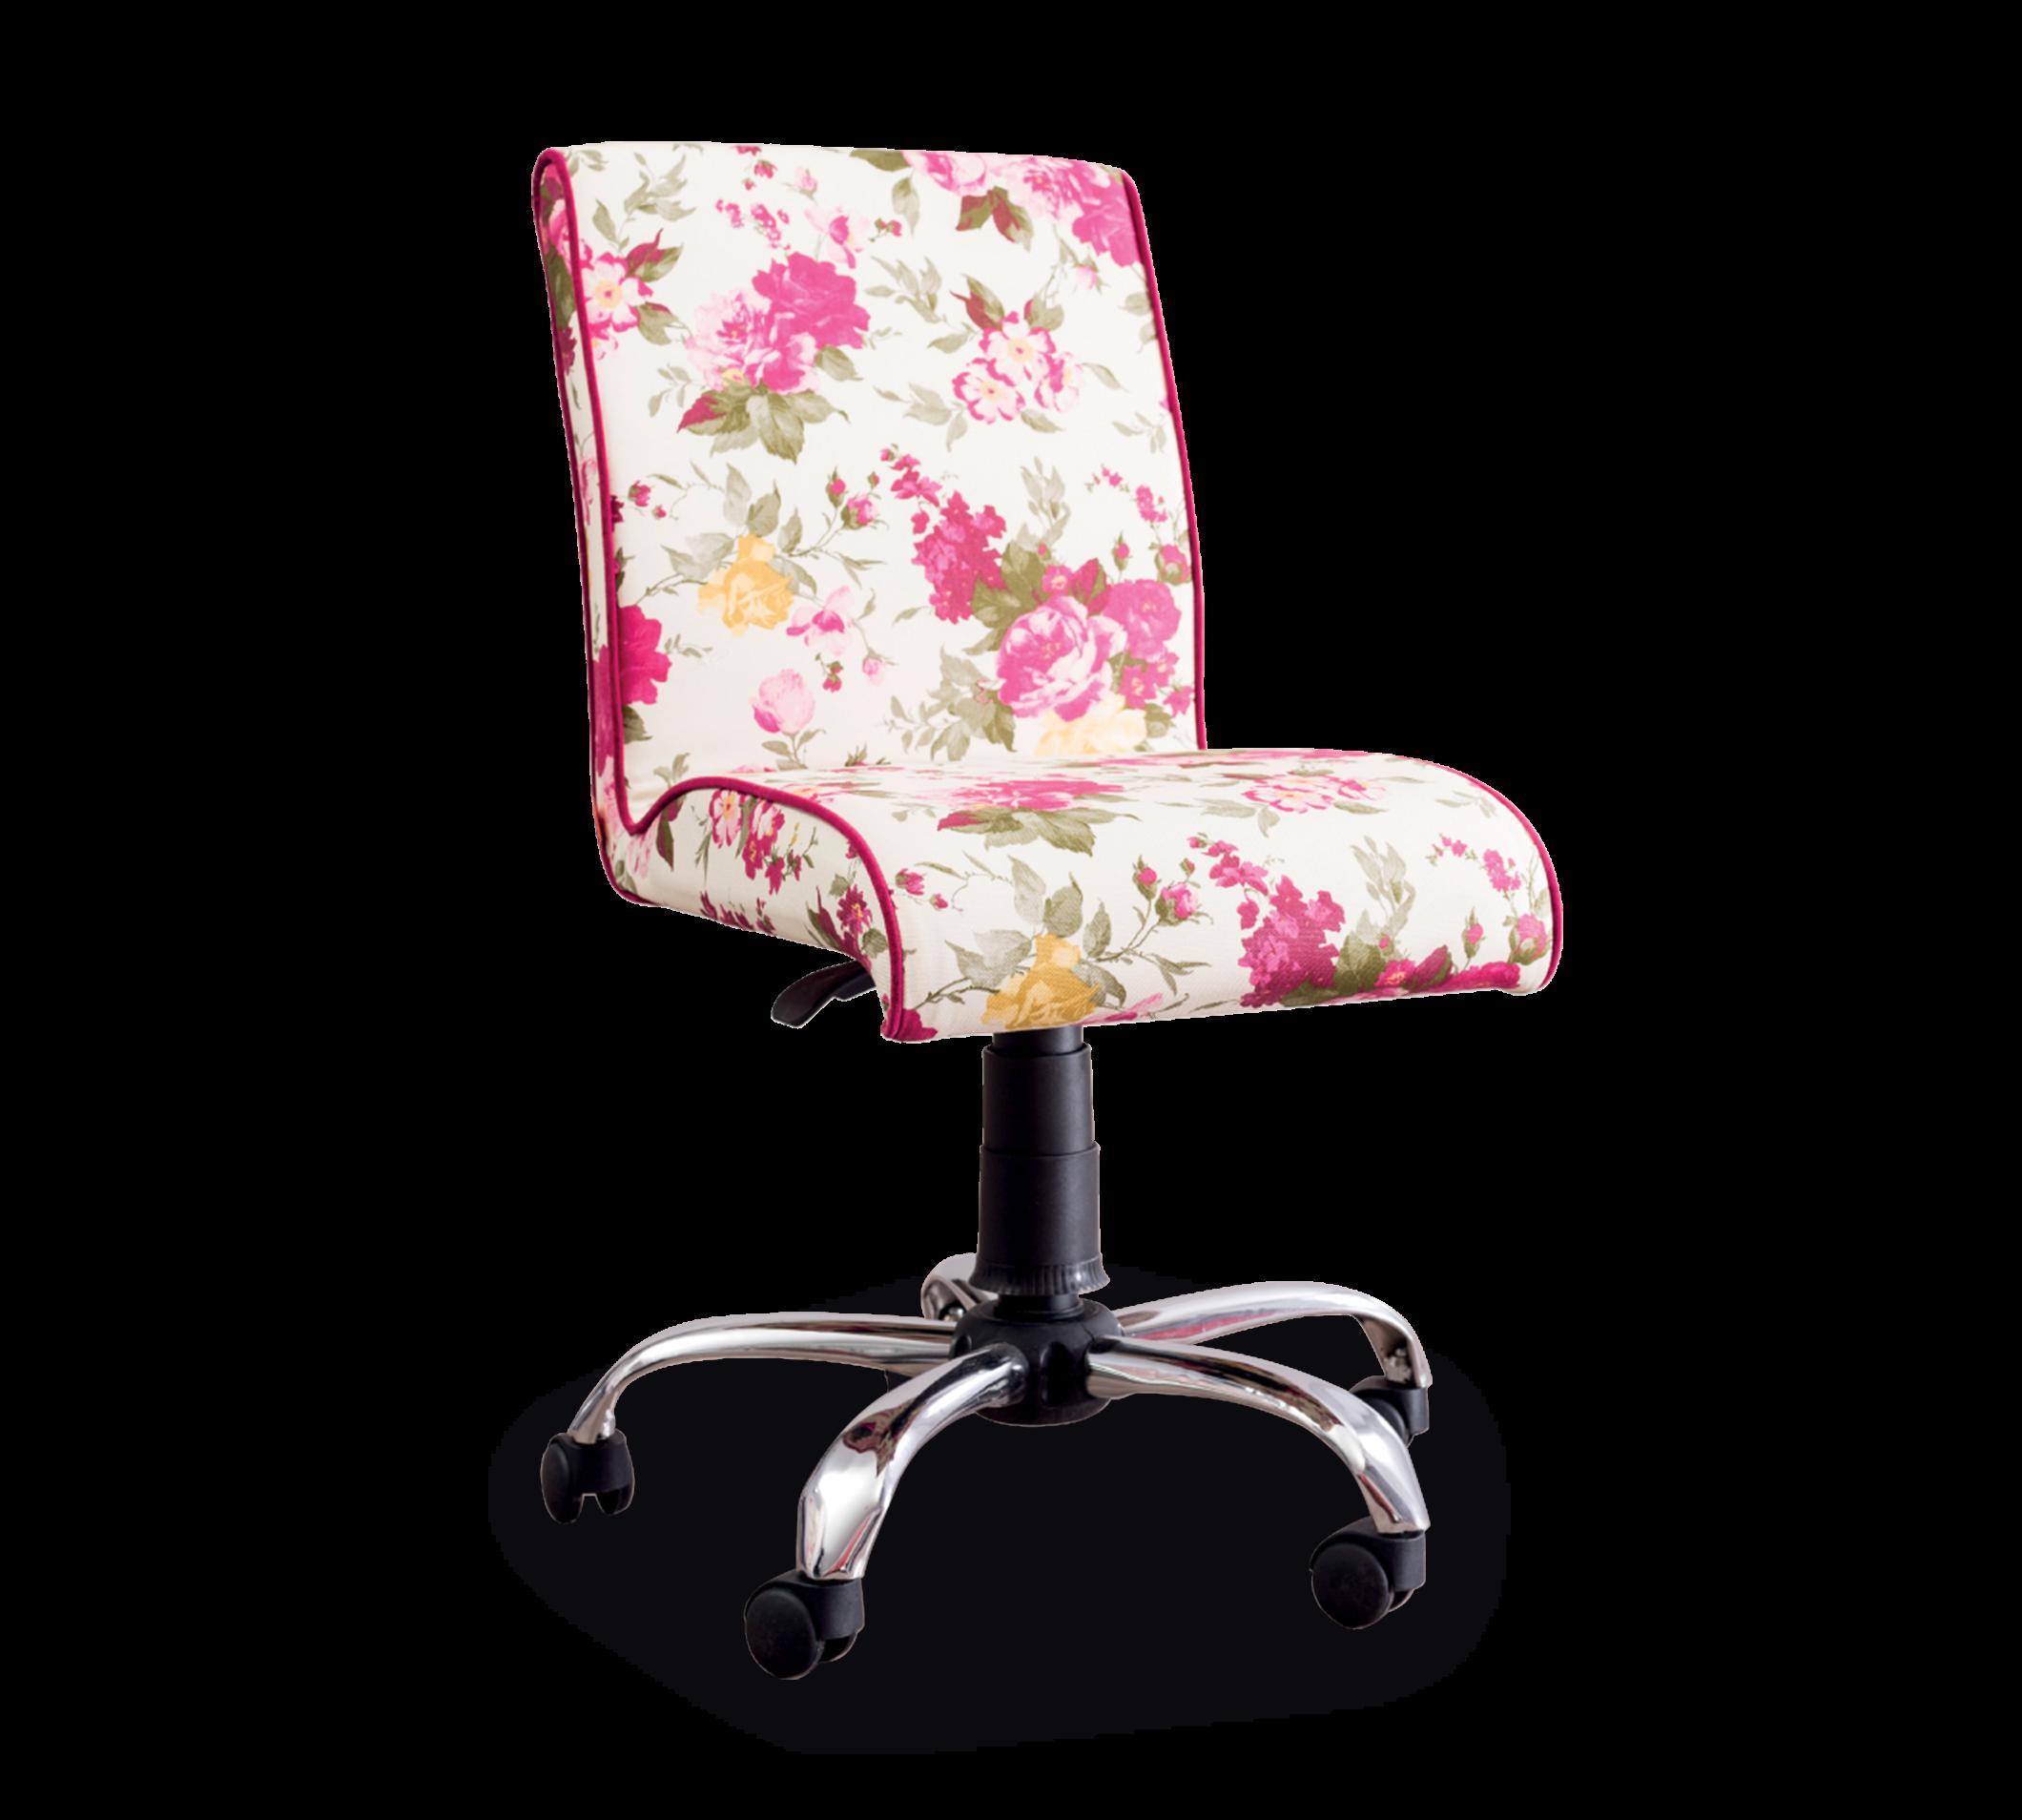 Scaun de birou pentru copii, tapitat cu stofa Summer Soft Flowers, l56xA60xH86-96 cm imagine